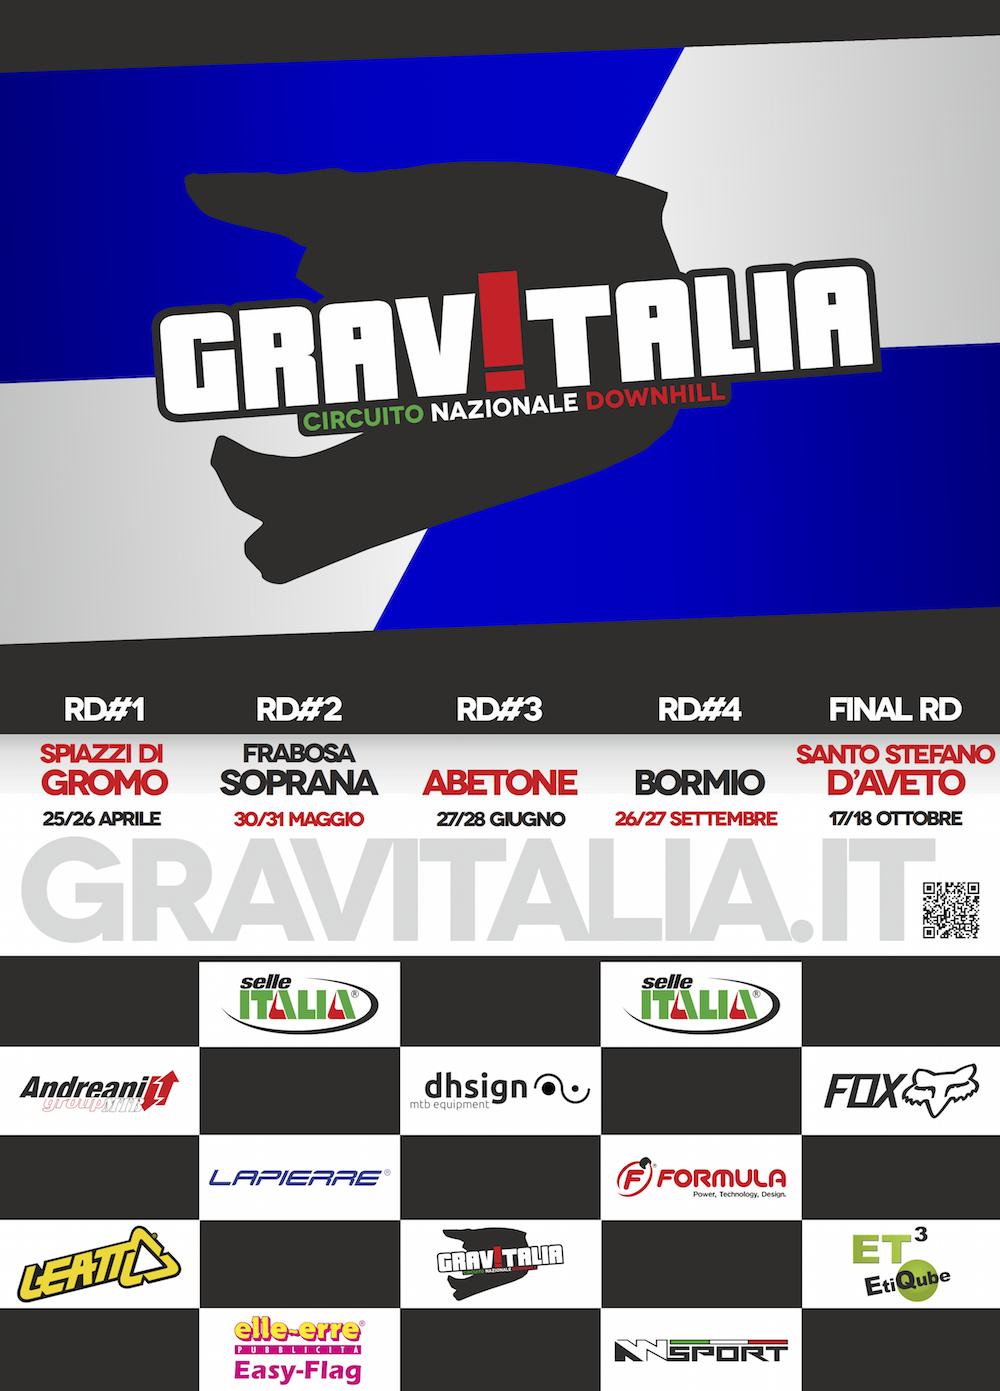 locandina gravitalia 2015